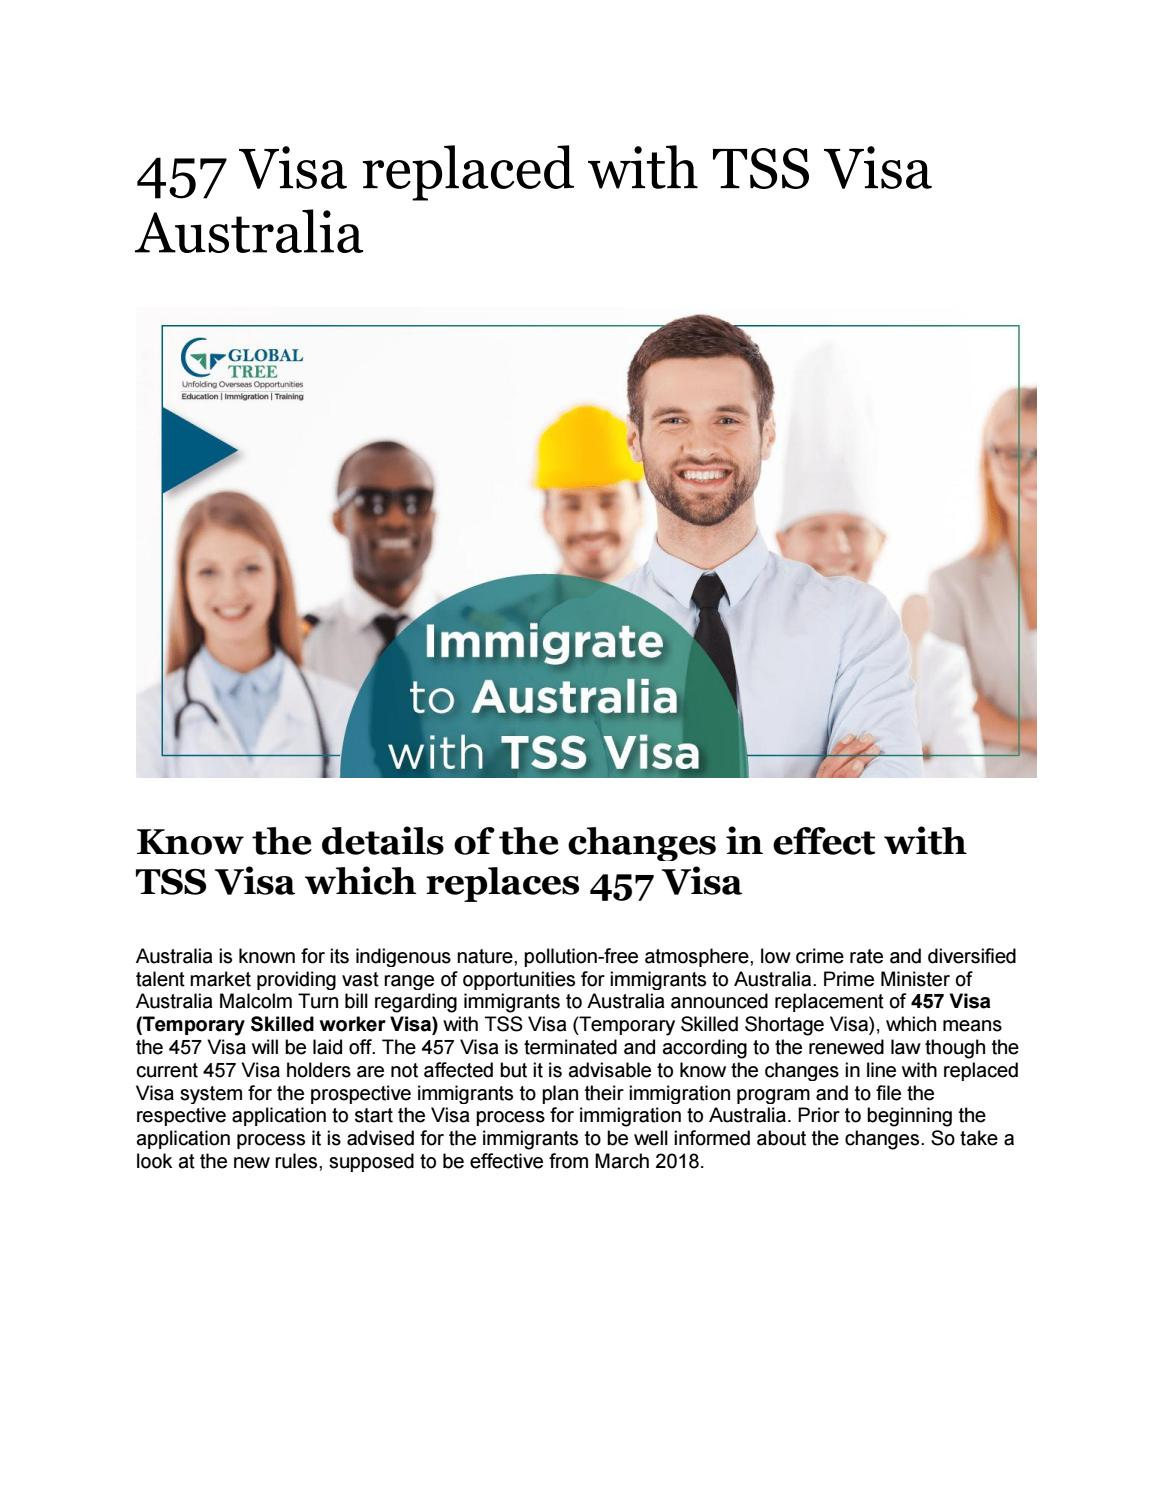 457 visa replaced with tss visa australia by Global Tree - issuu